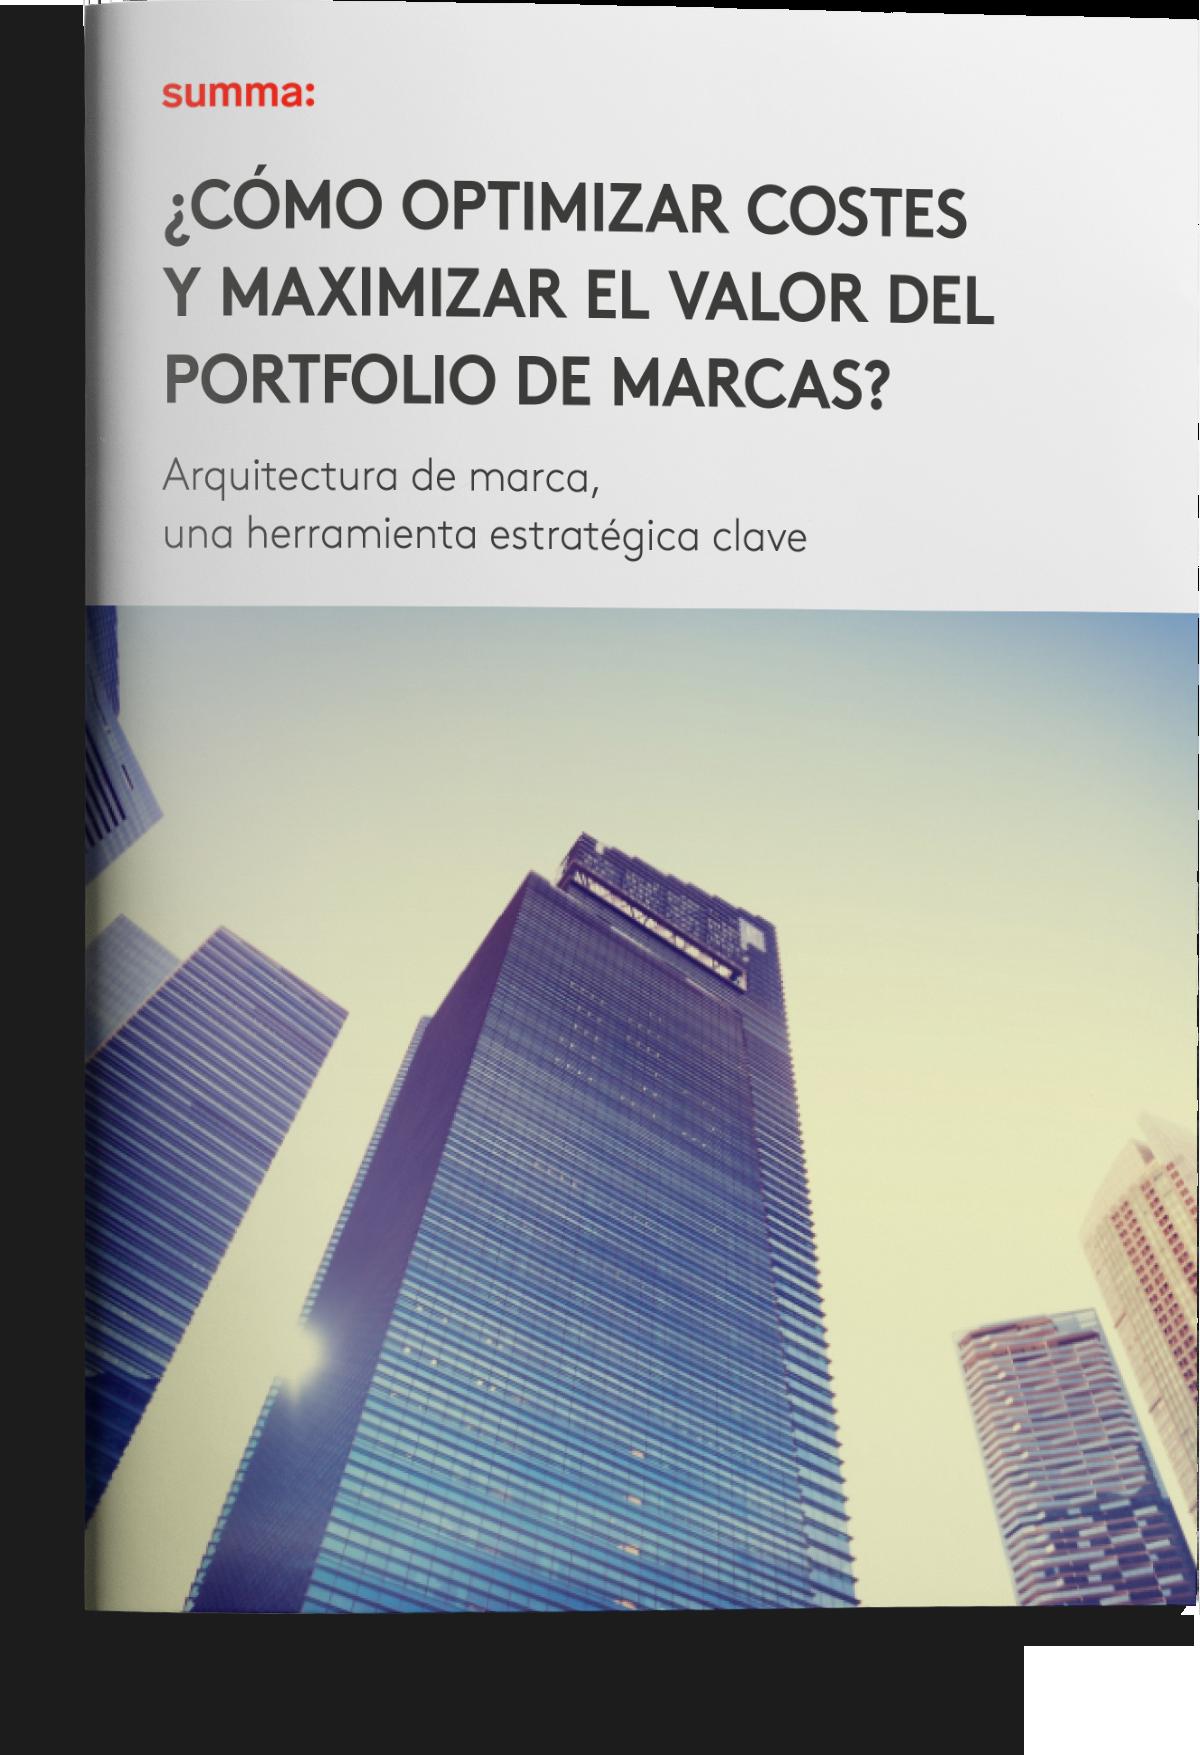 SUM - Arquitectura de marca - Portada (1).png